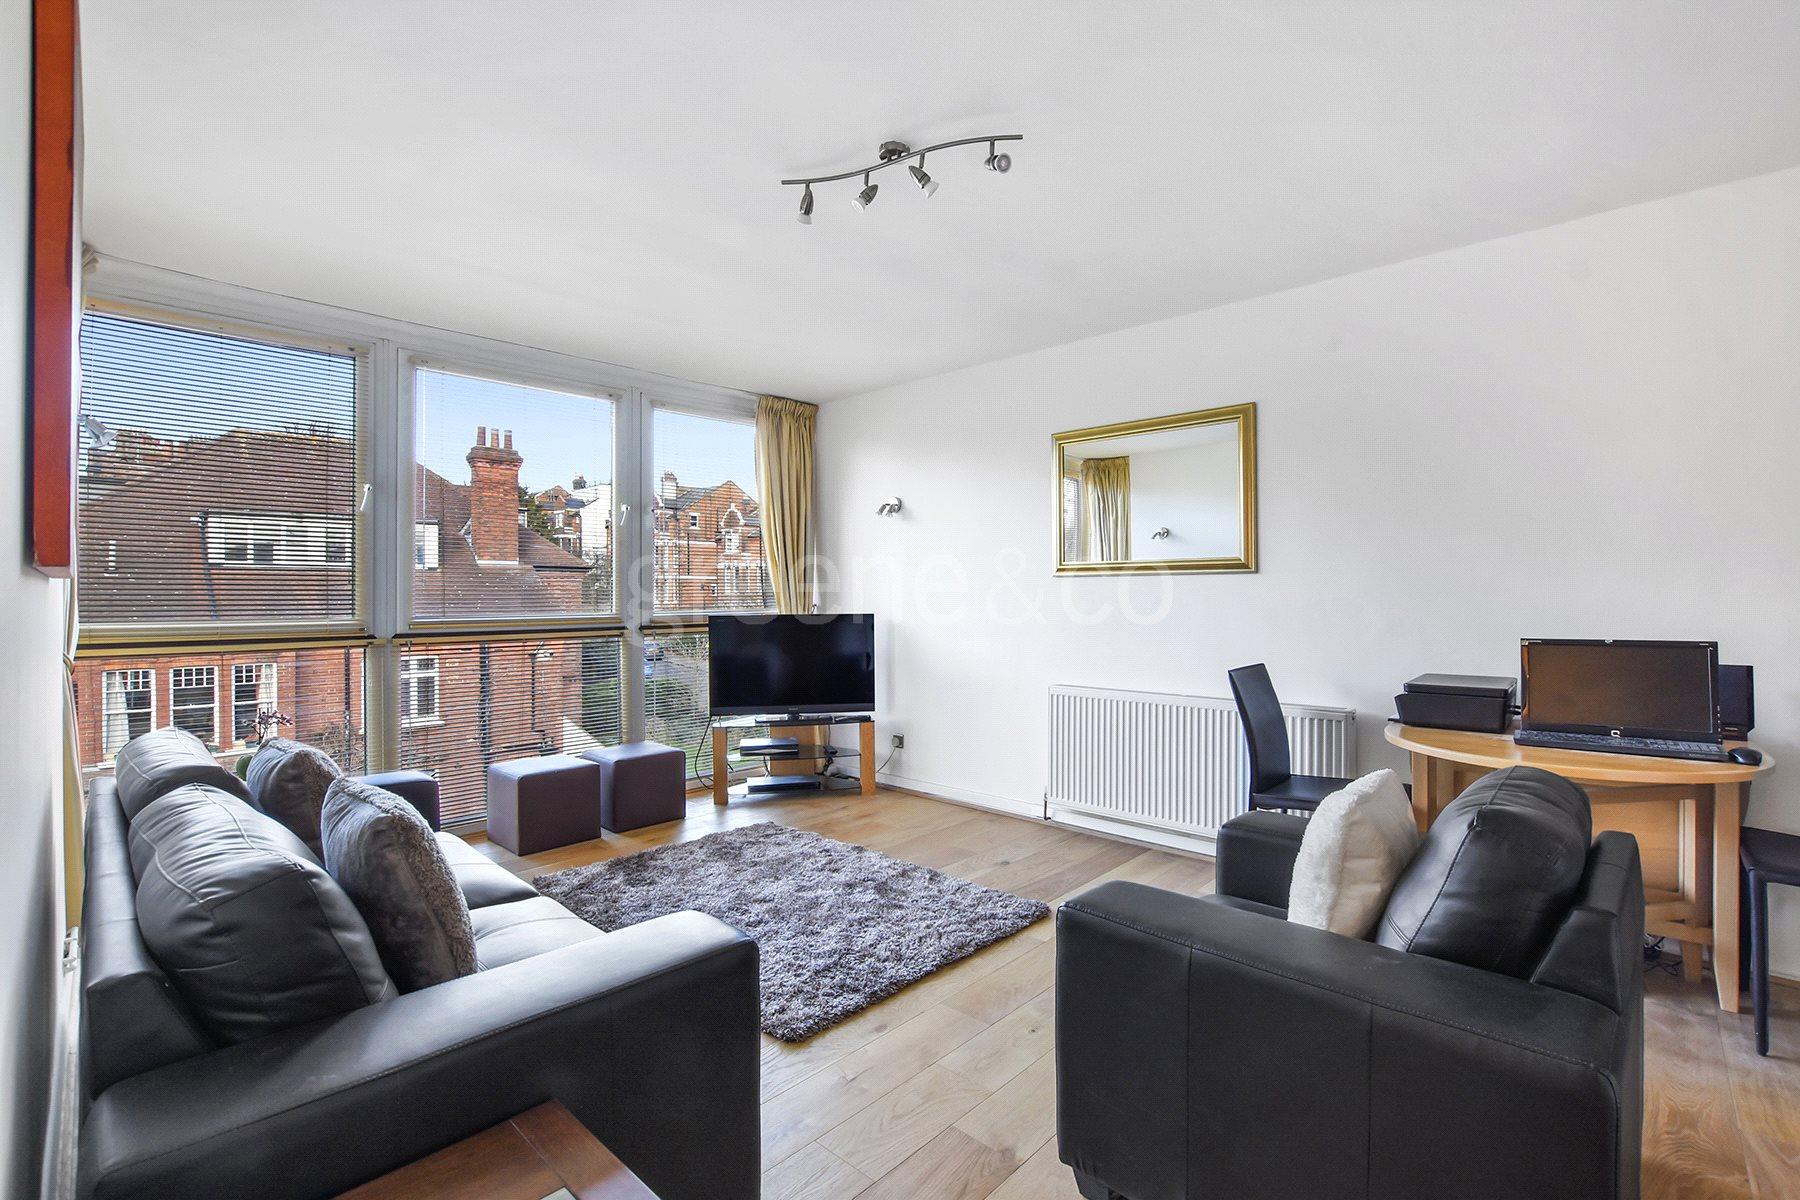 2 Bedrooms Flat for sale in Hurst Lodge, Coolhurst Road, London, N8